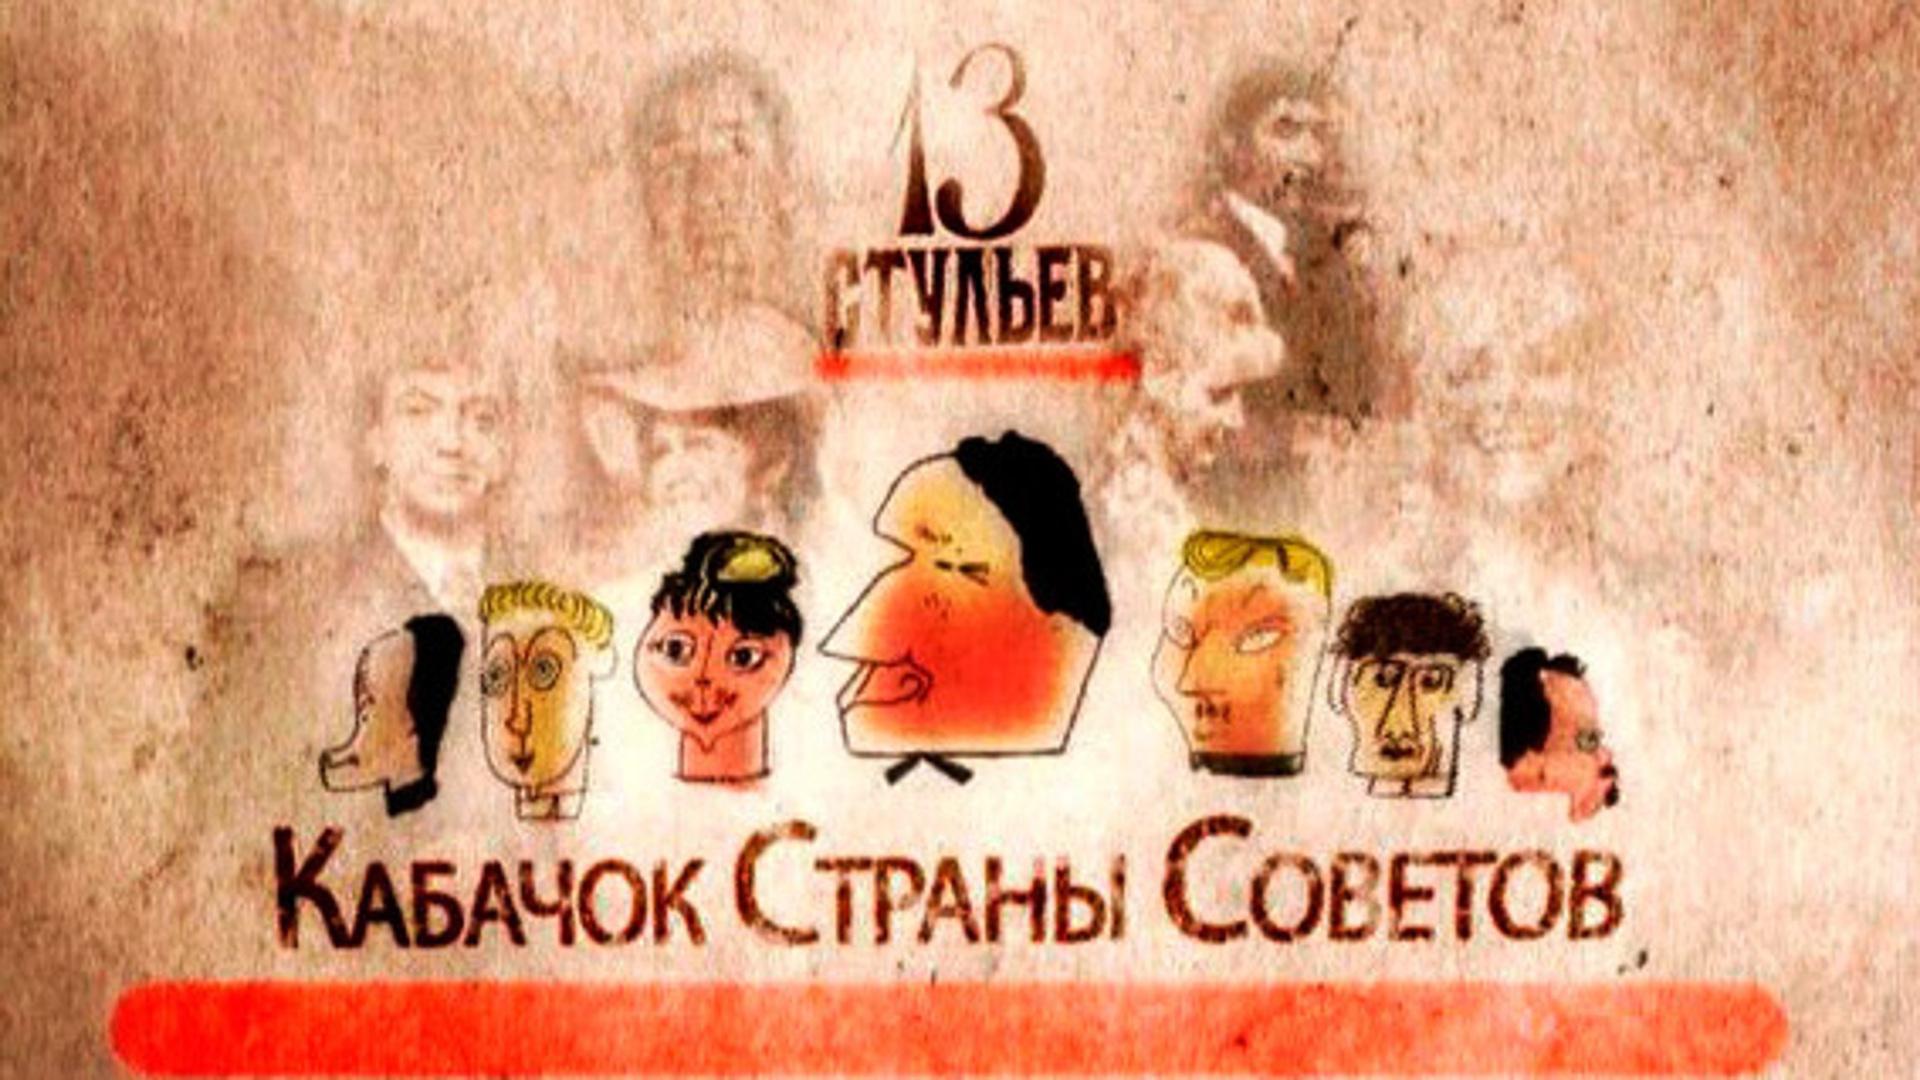 Кабачок страны Советов